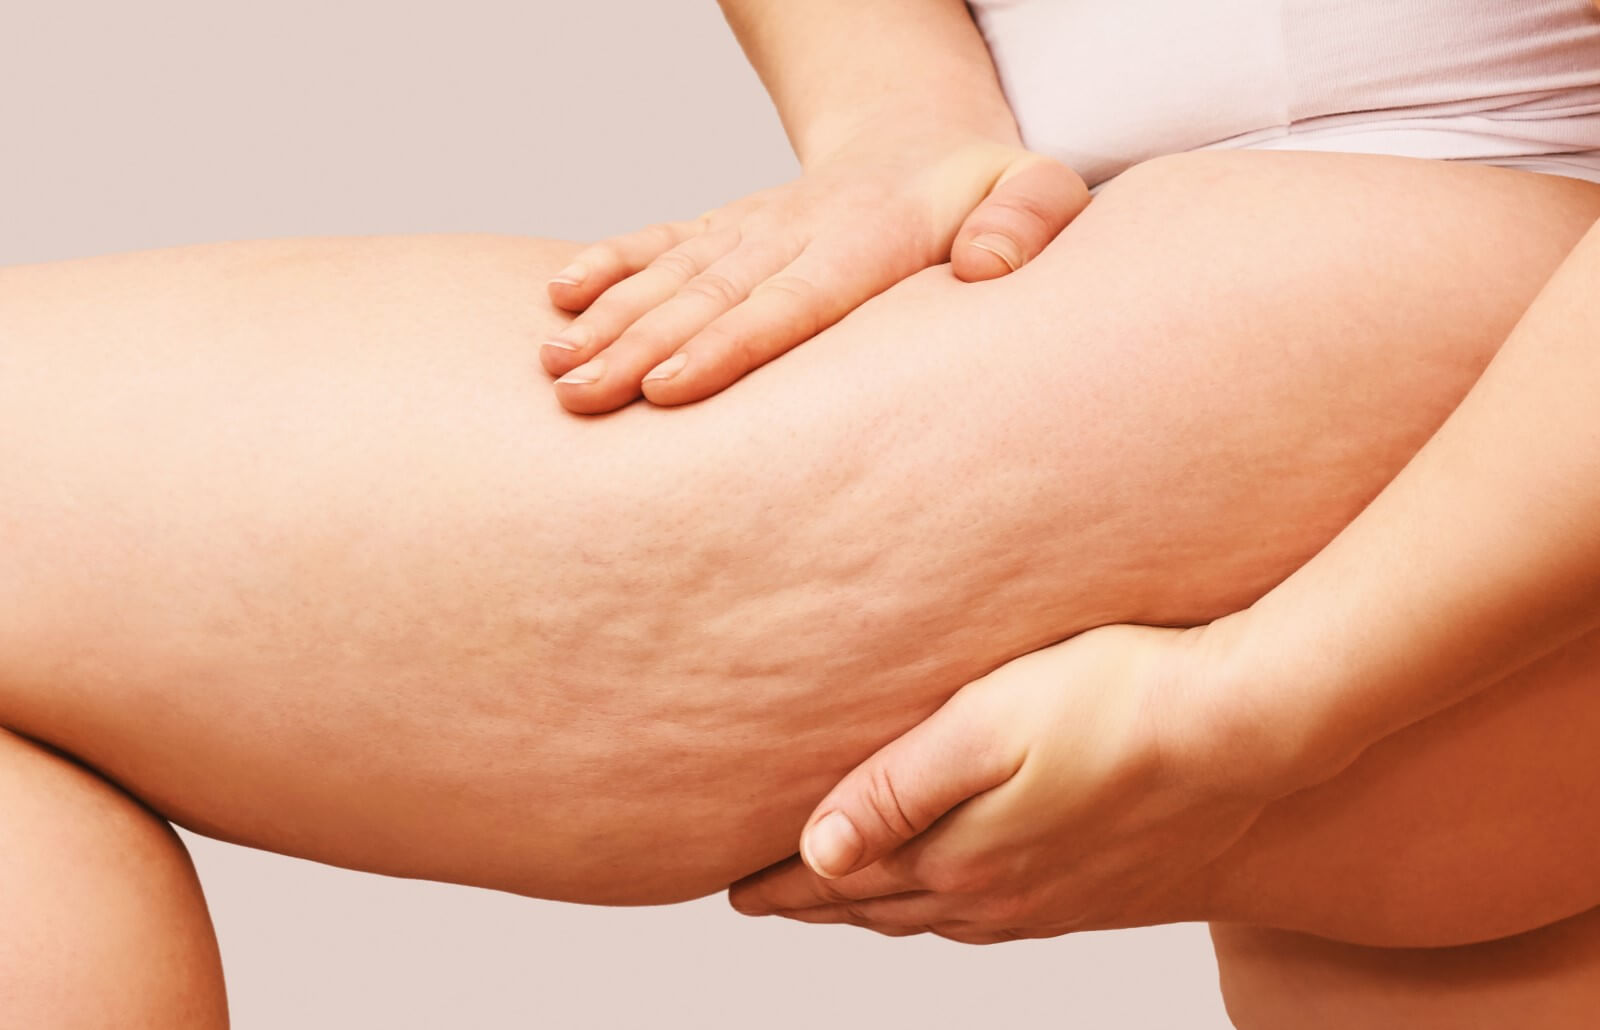 Cellfina: Treatment for Cellulite